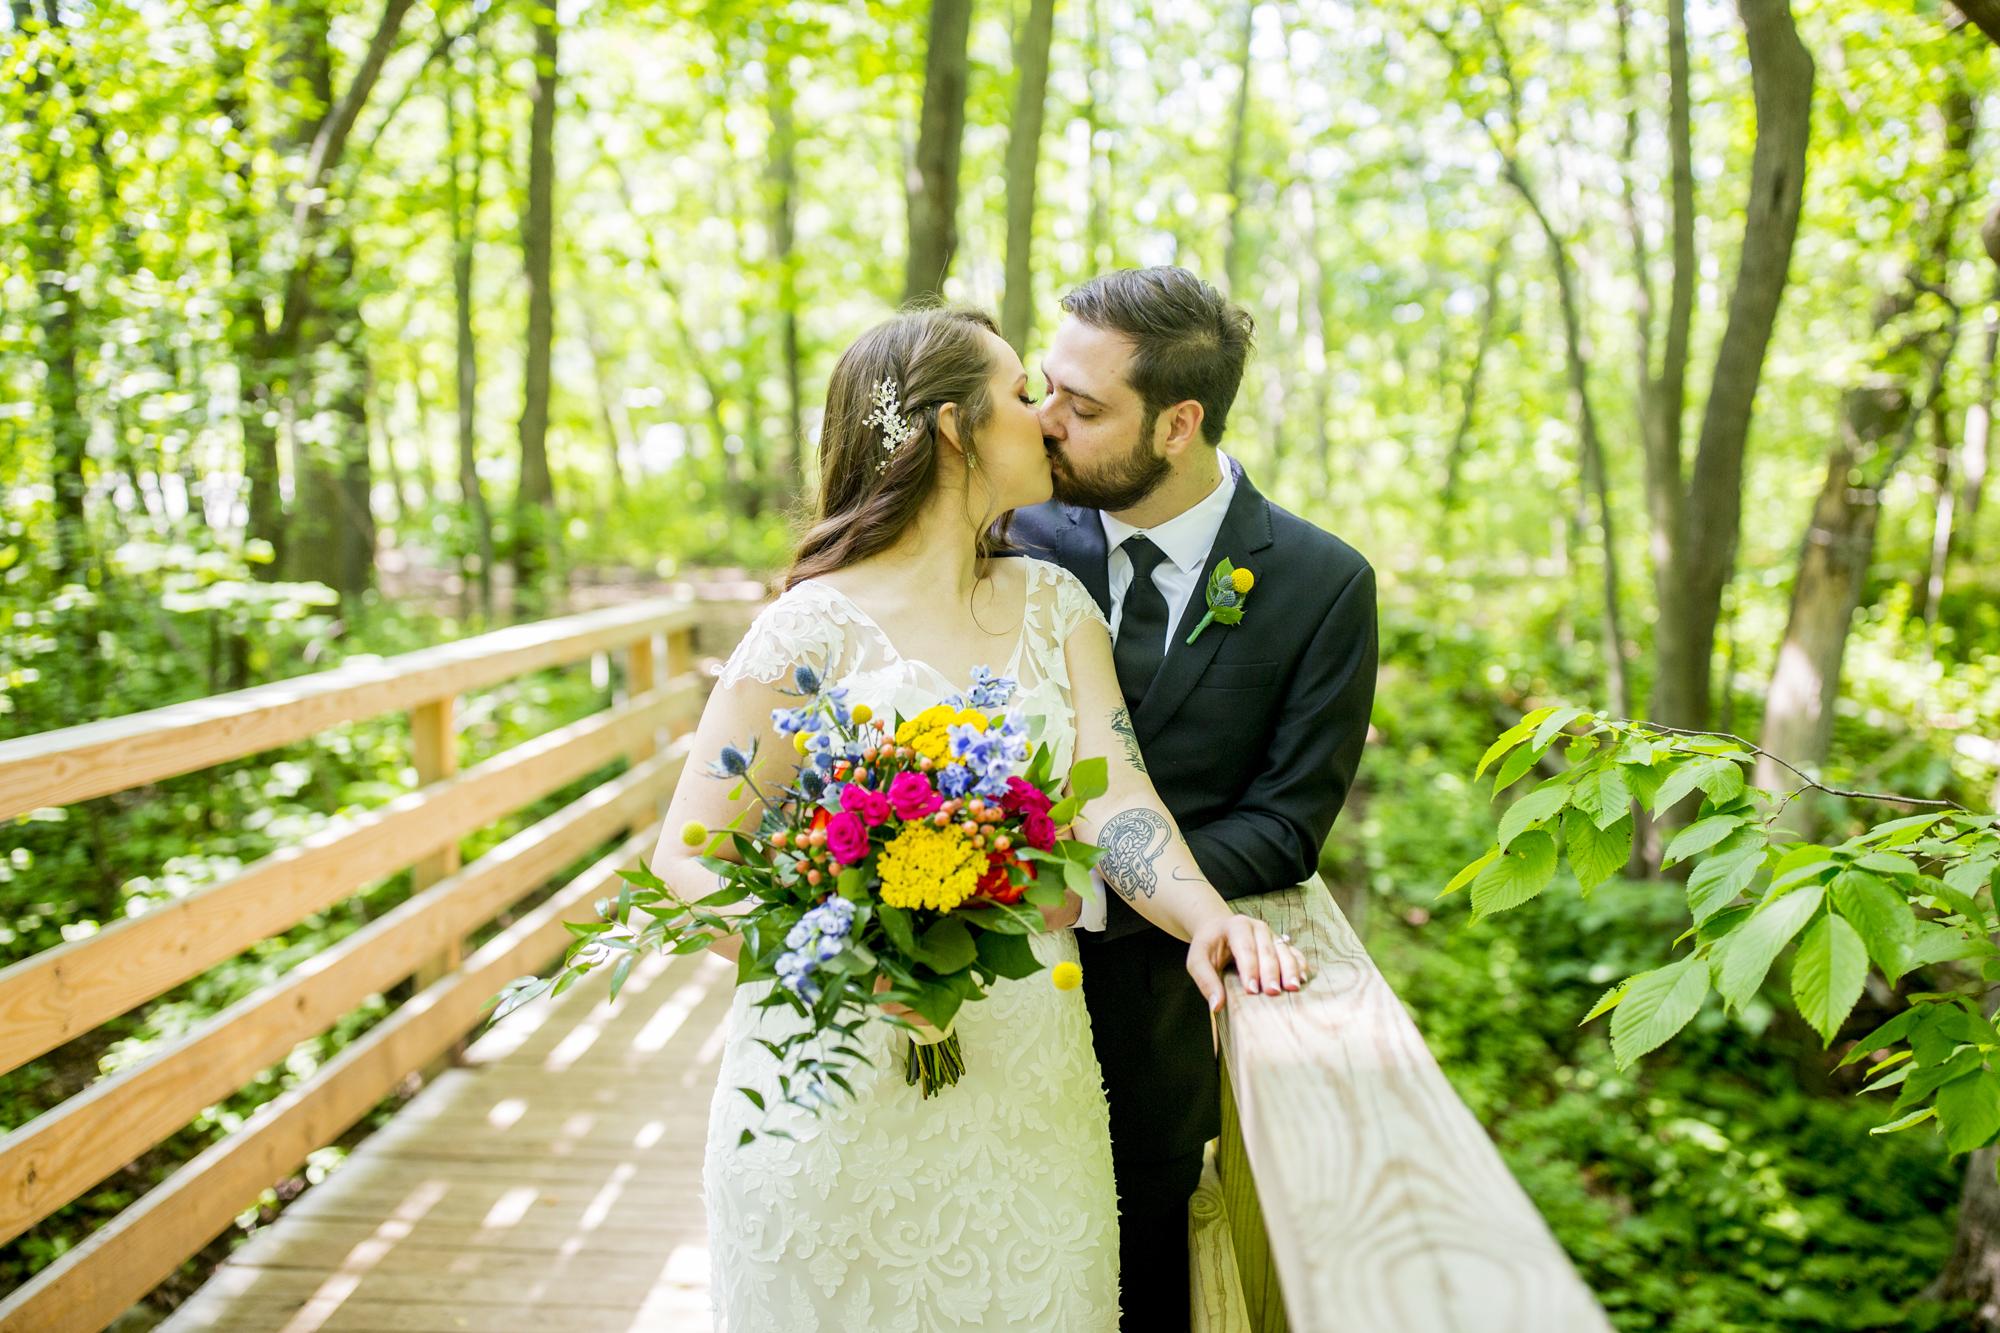 Seriously_Sabrina_Photography_Milwaukee_Wisconsin_Wedding_Schlitz_Audubon_Nature_Center_BrunderRife24.jpg